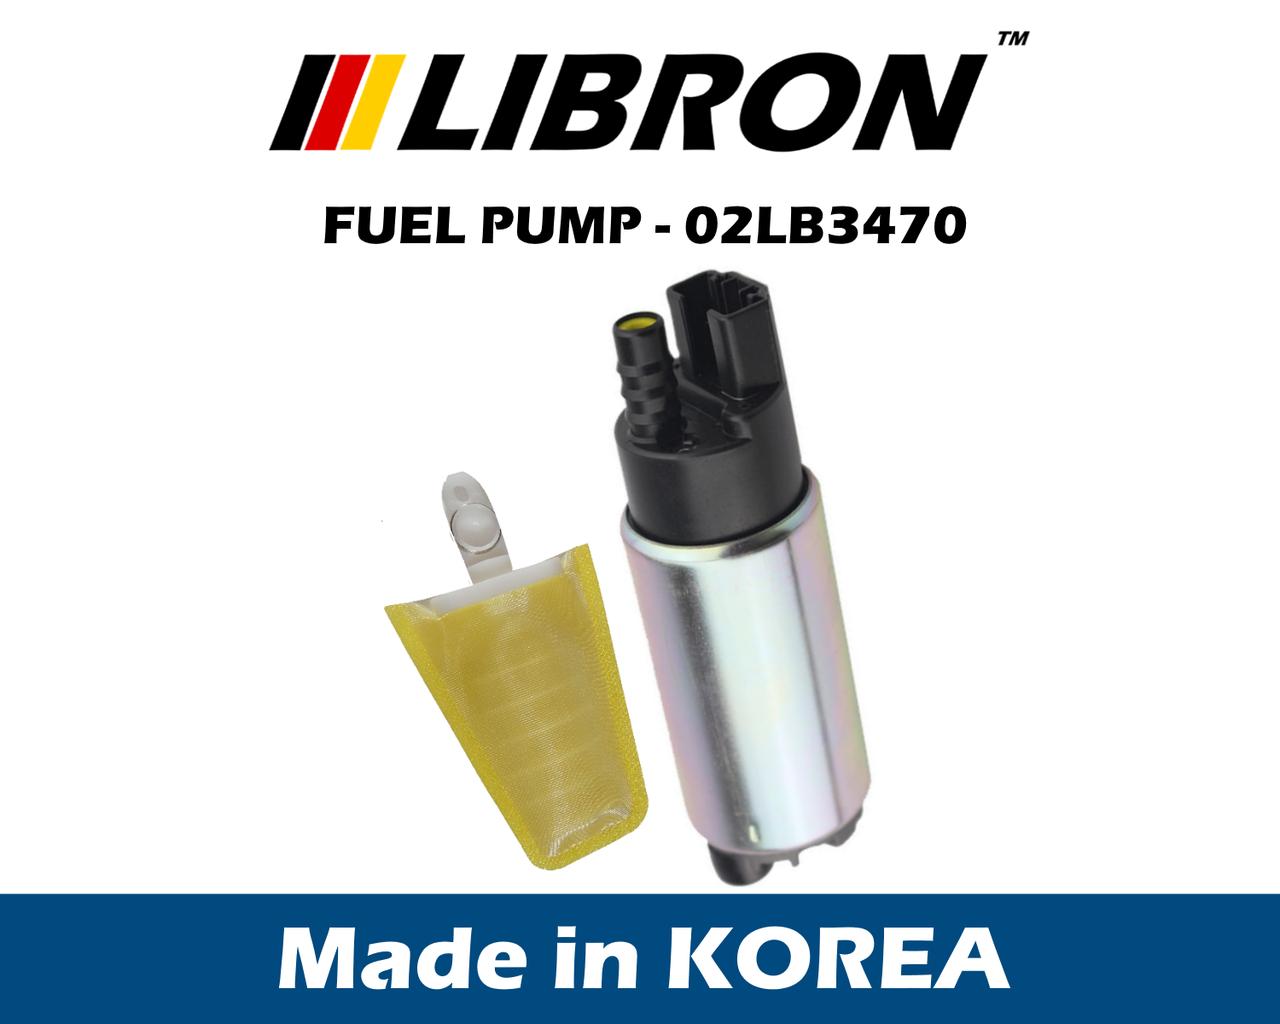 Топливный насос LIBRON 02LB3470 - Honda ACCORD VI (1996-1998)